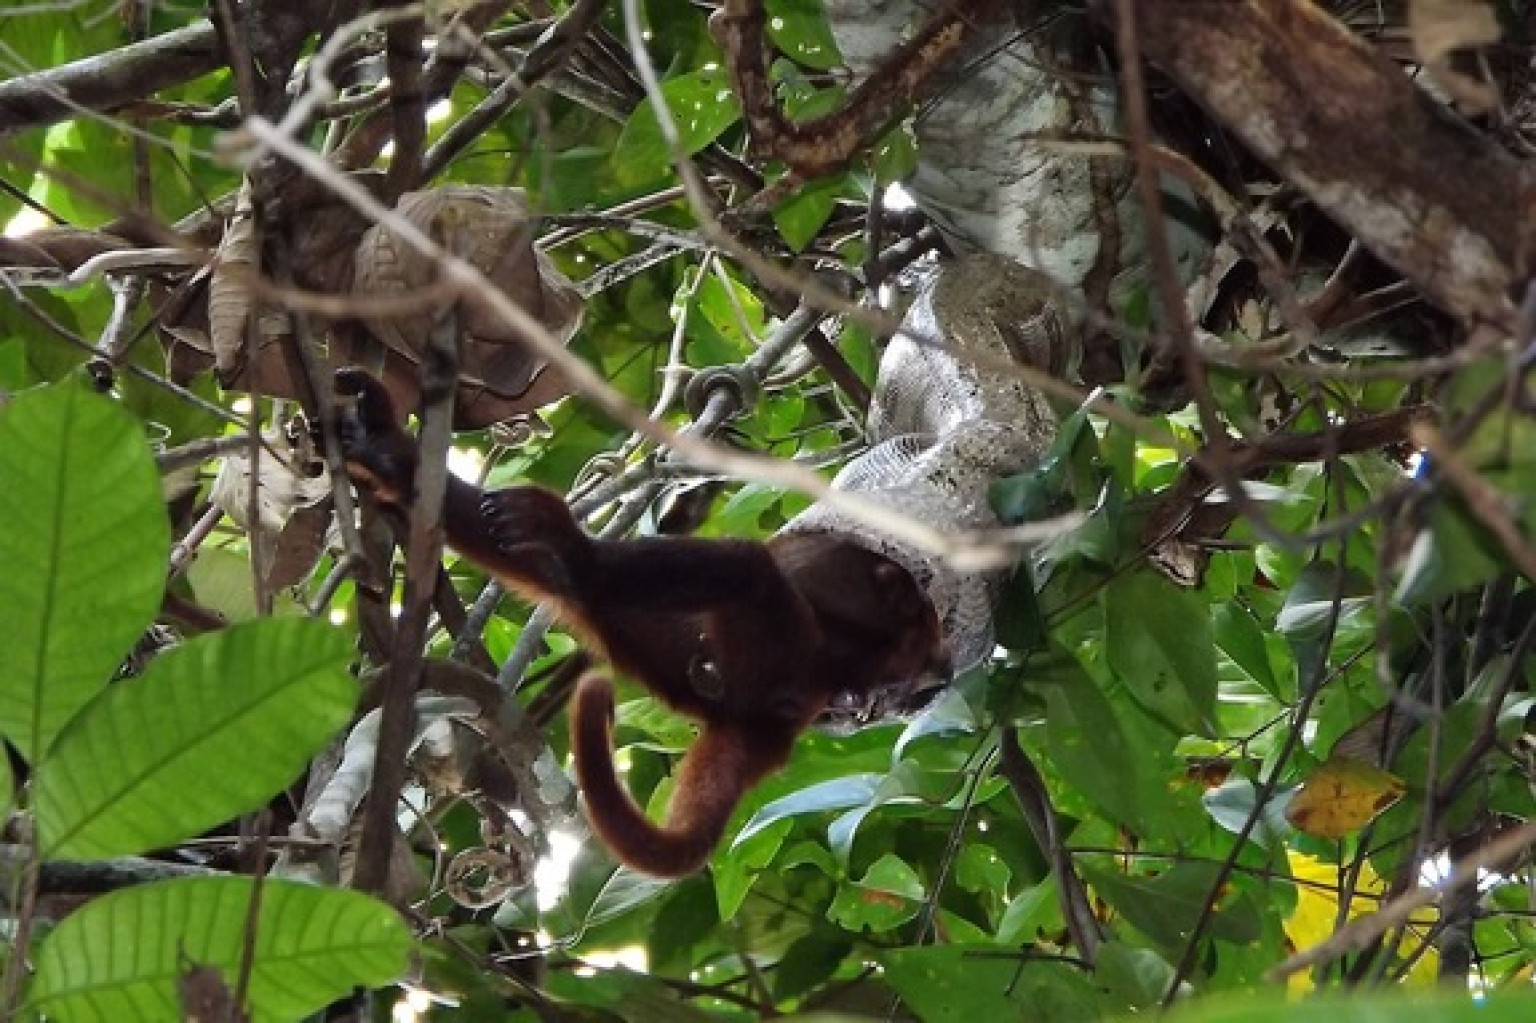 predator prey relationship apes and monkeys